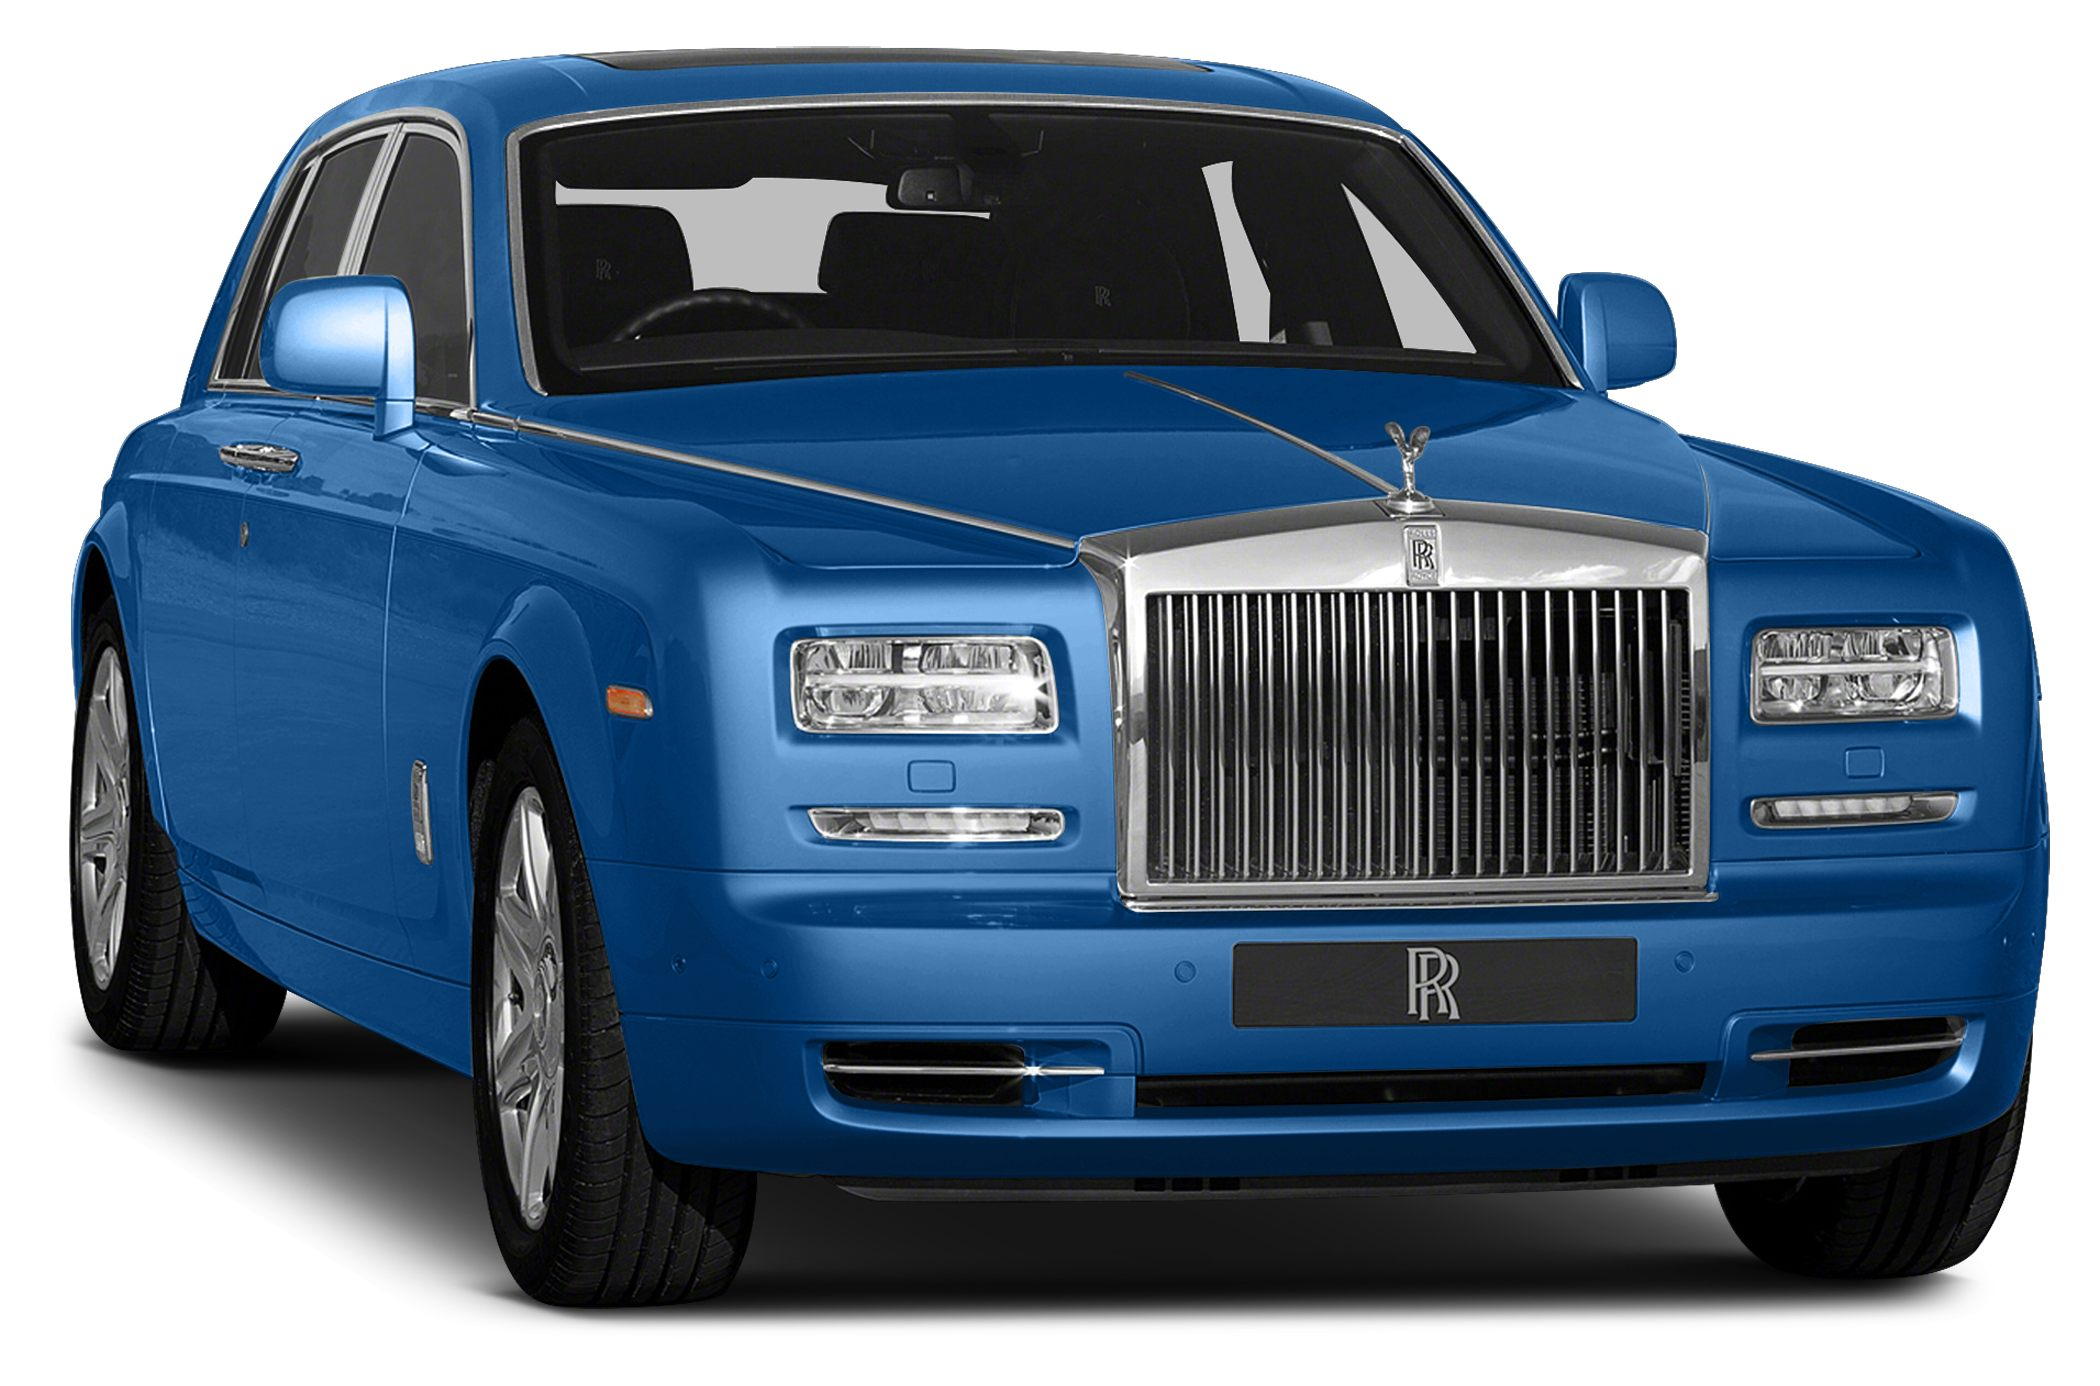 2014 rollsroyce phantom pictures amp photos carsdirect